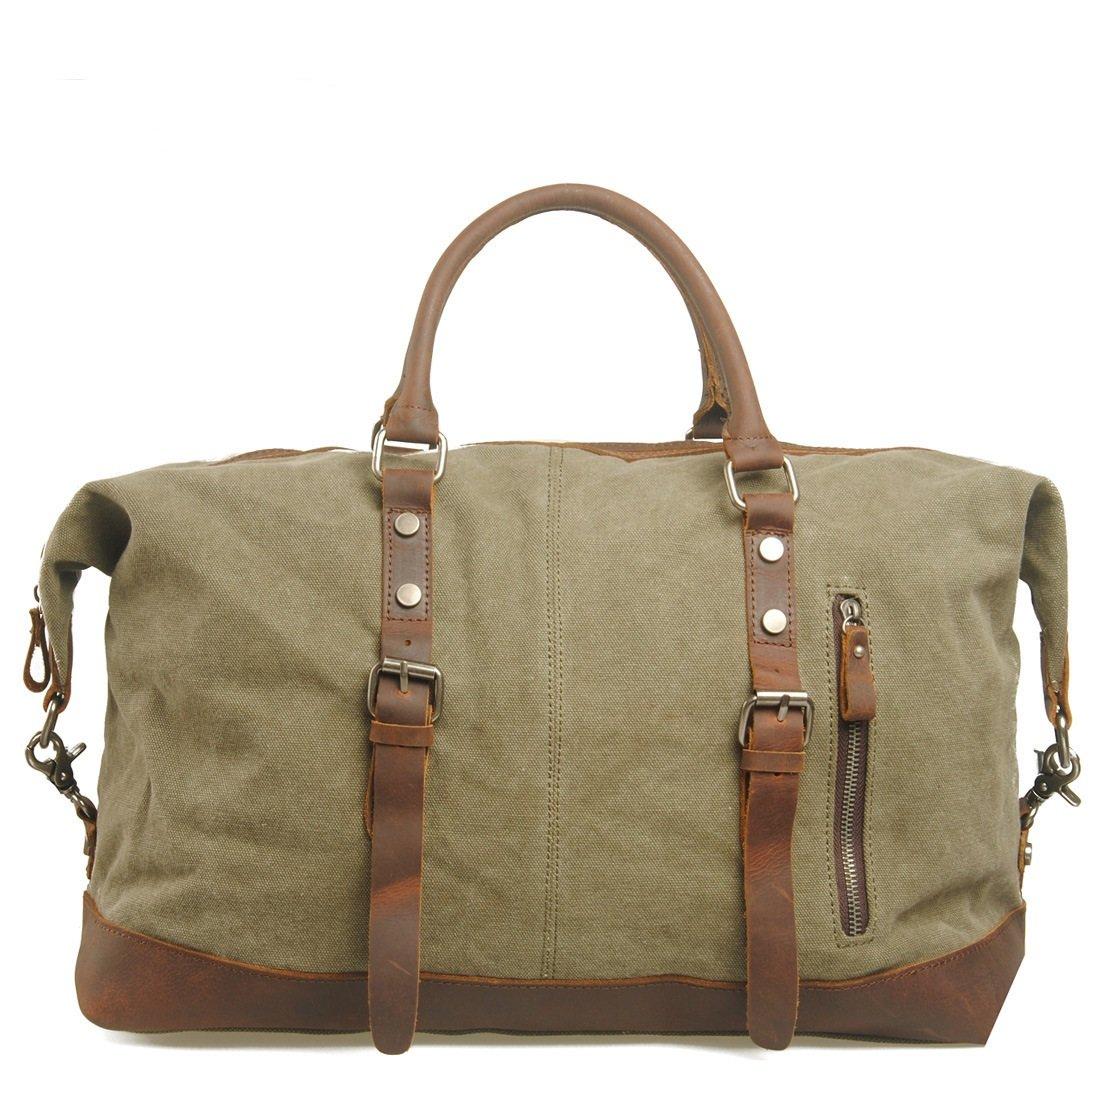 GLJJQMY カジュアルバッグ大容量モバイルスロー男性用バッグスーツバッグ、45 x 20 x 35cm トラベルバッグ B07M84M98M